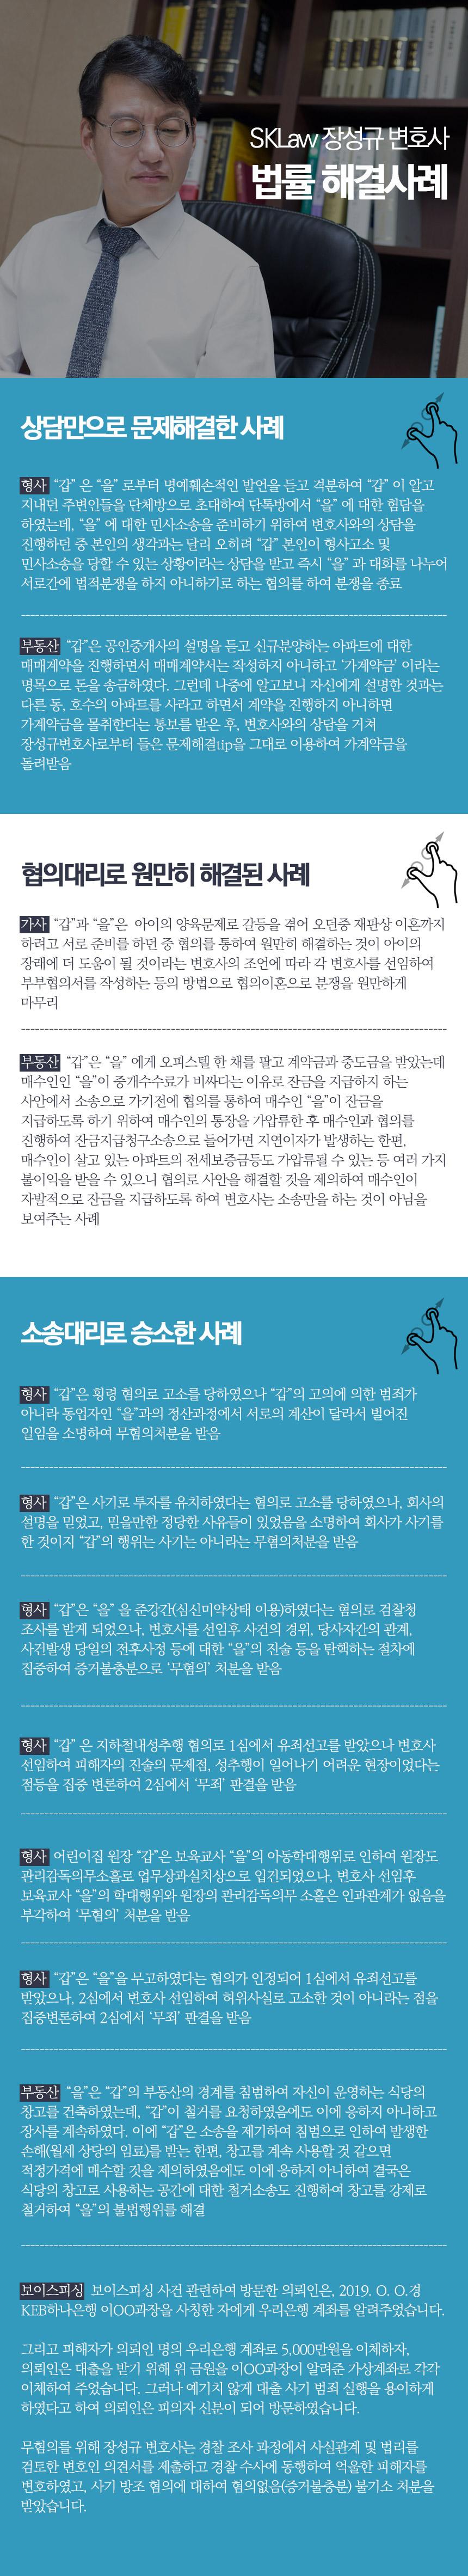 SKLaw 장성규 변호사 부동산 해결사례